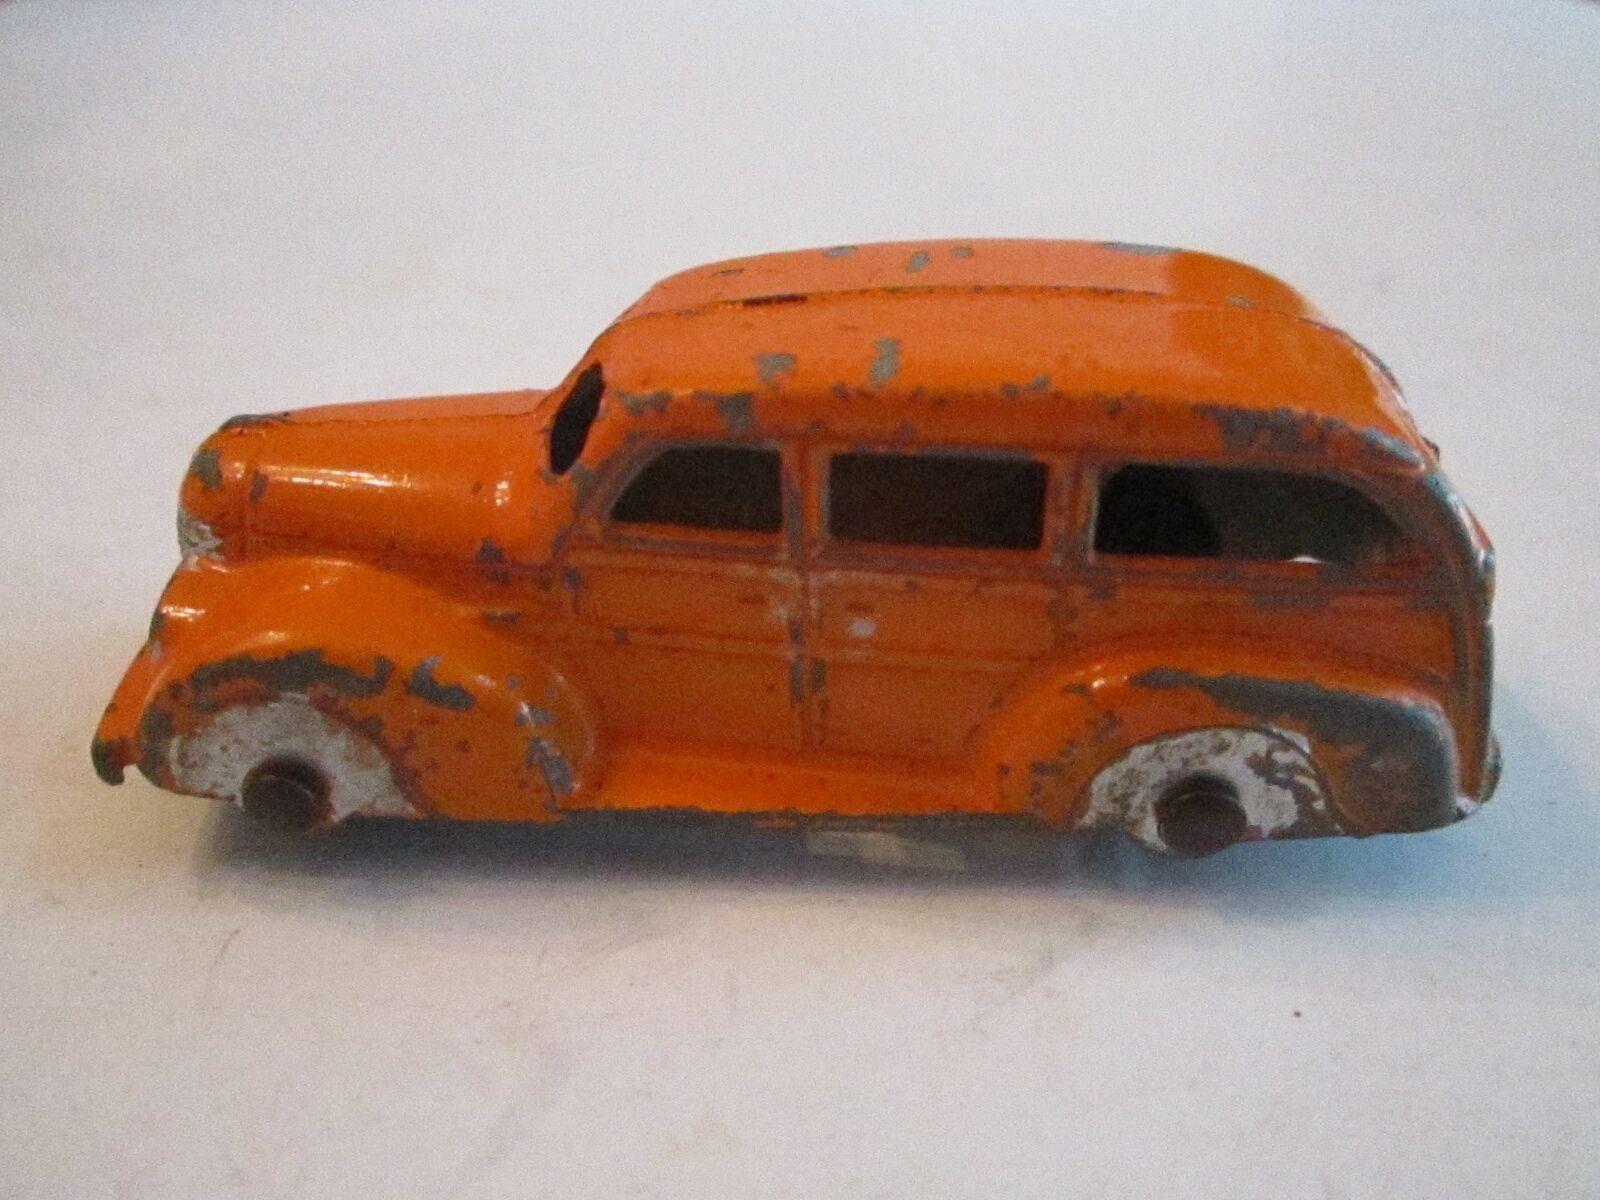 TOOTSIE TOY orange CAR - 3  - MB 1